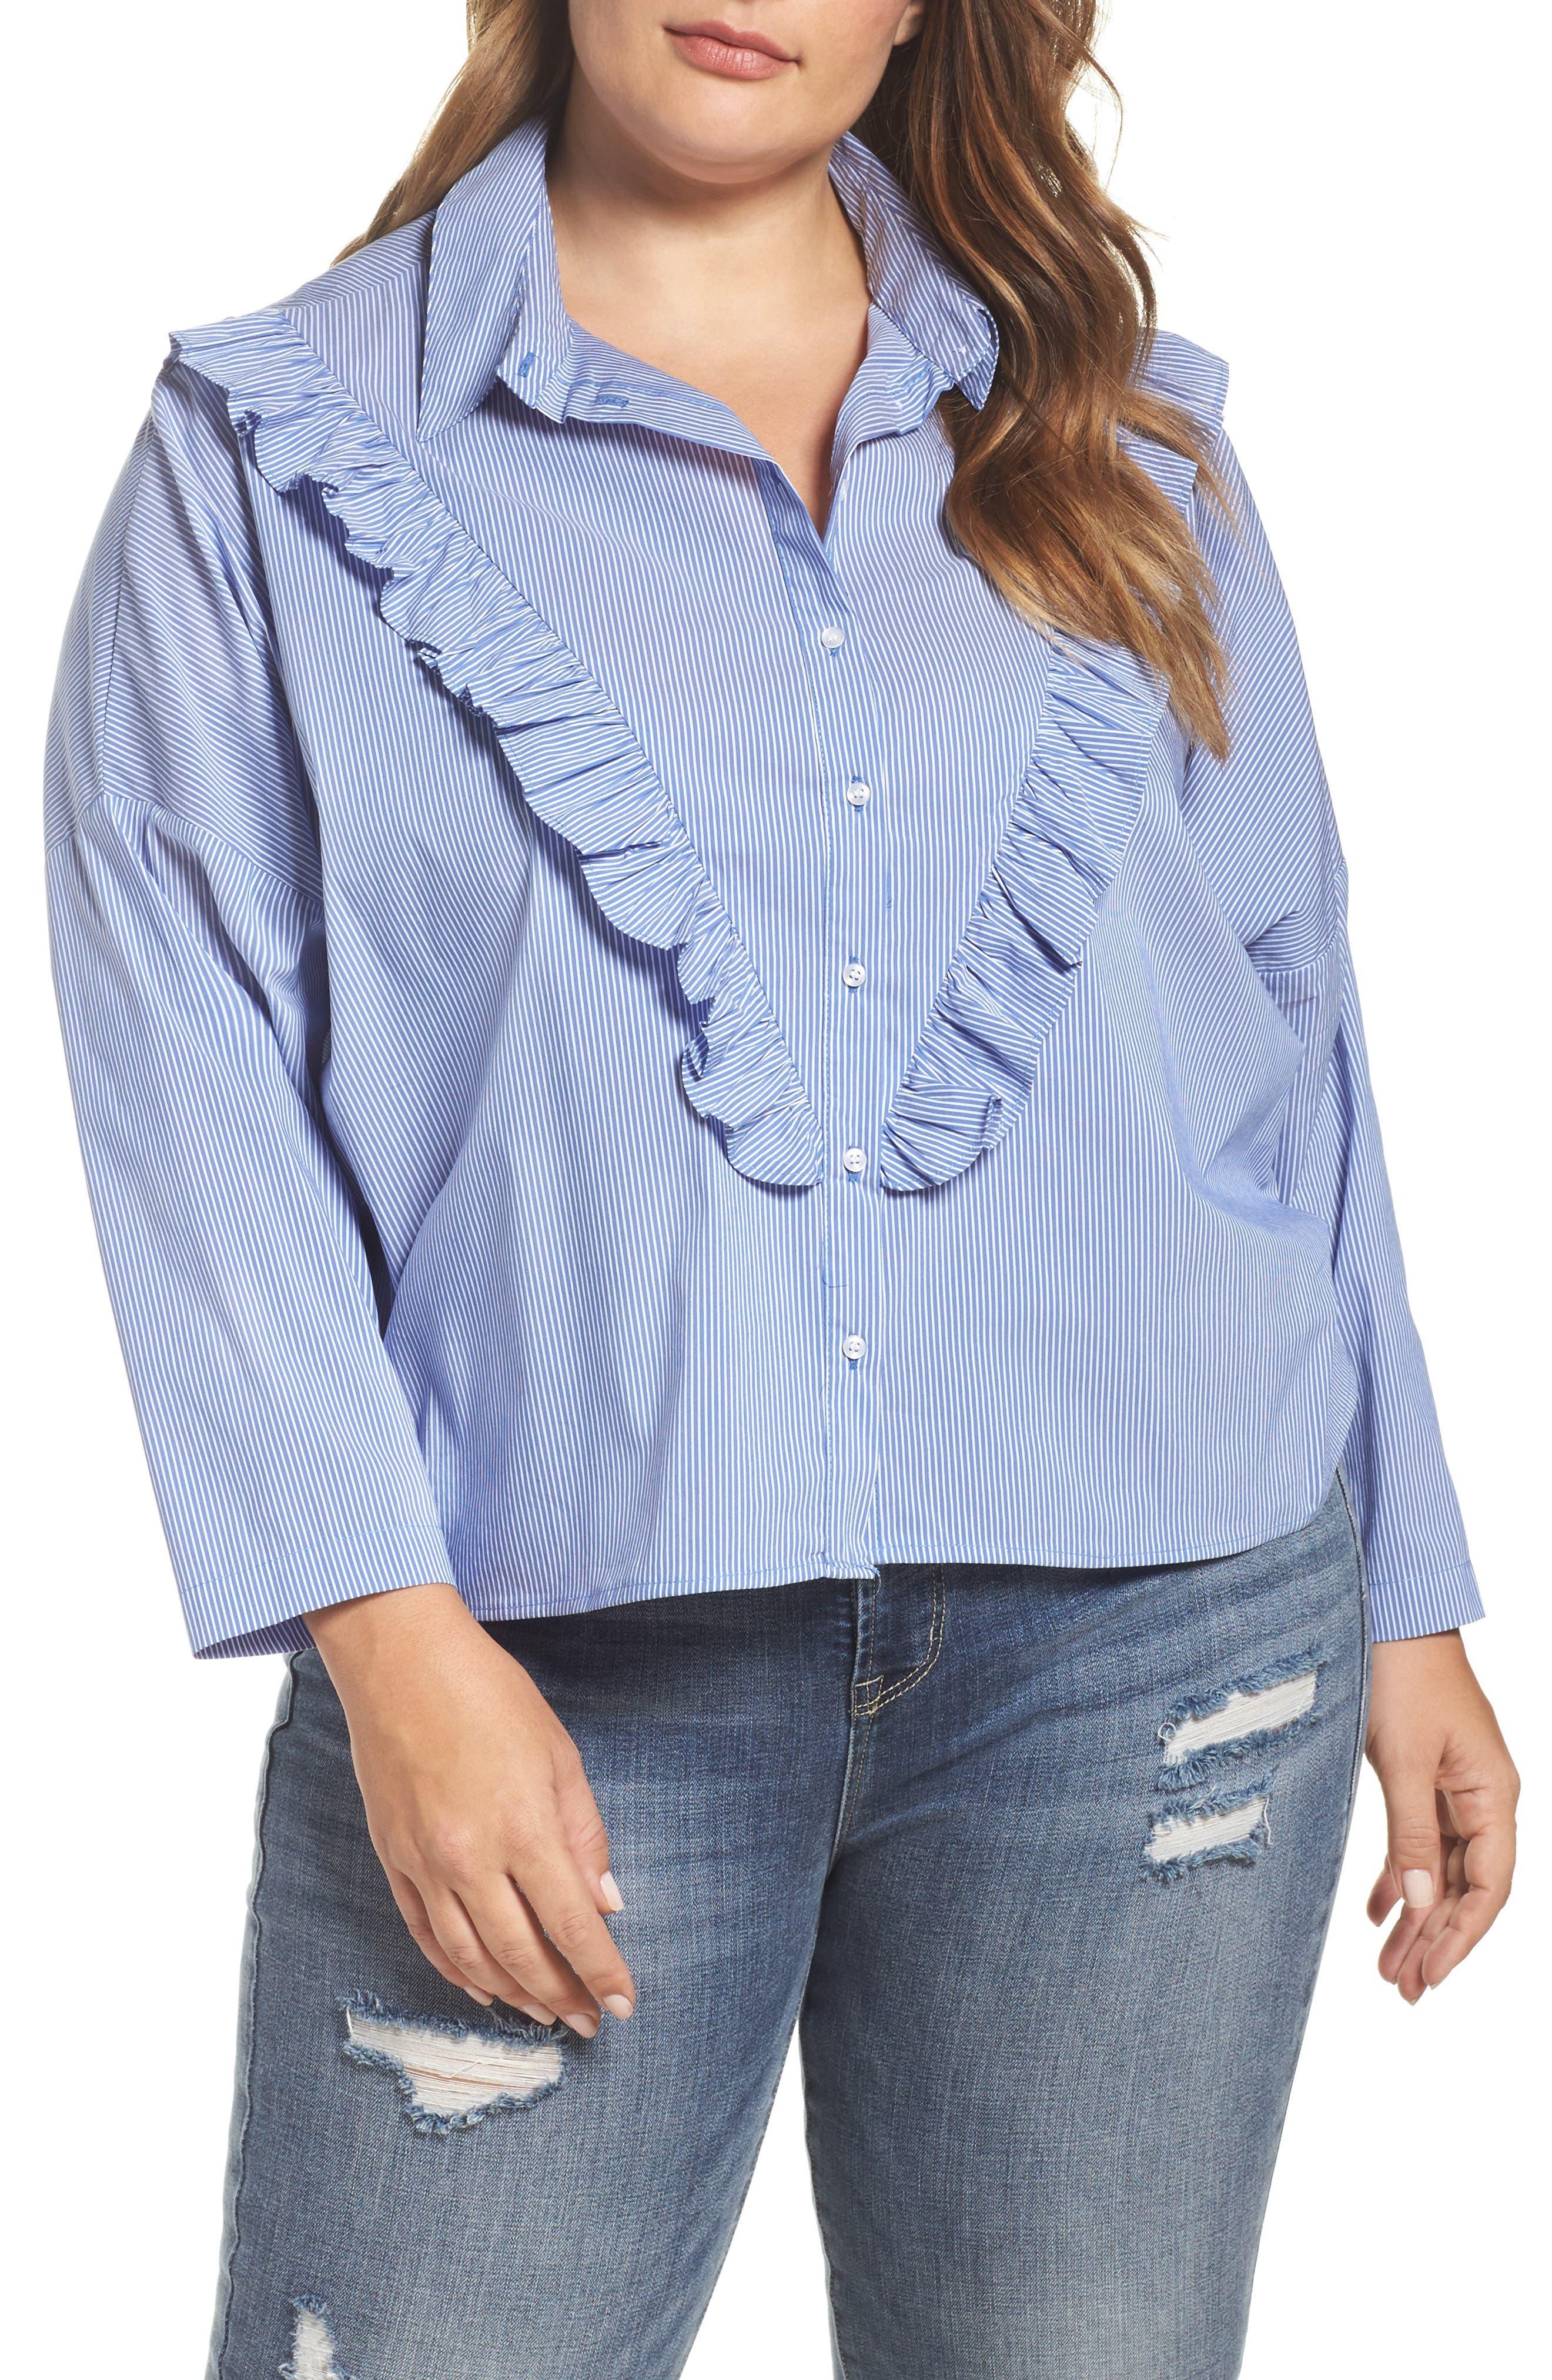 ELVI Striped Ruffle Shirt (Plus Size)